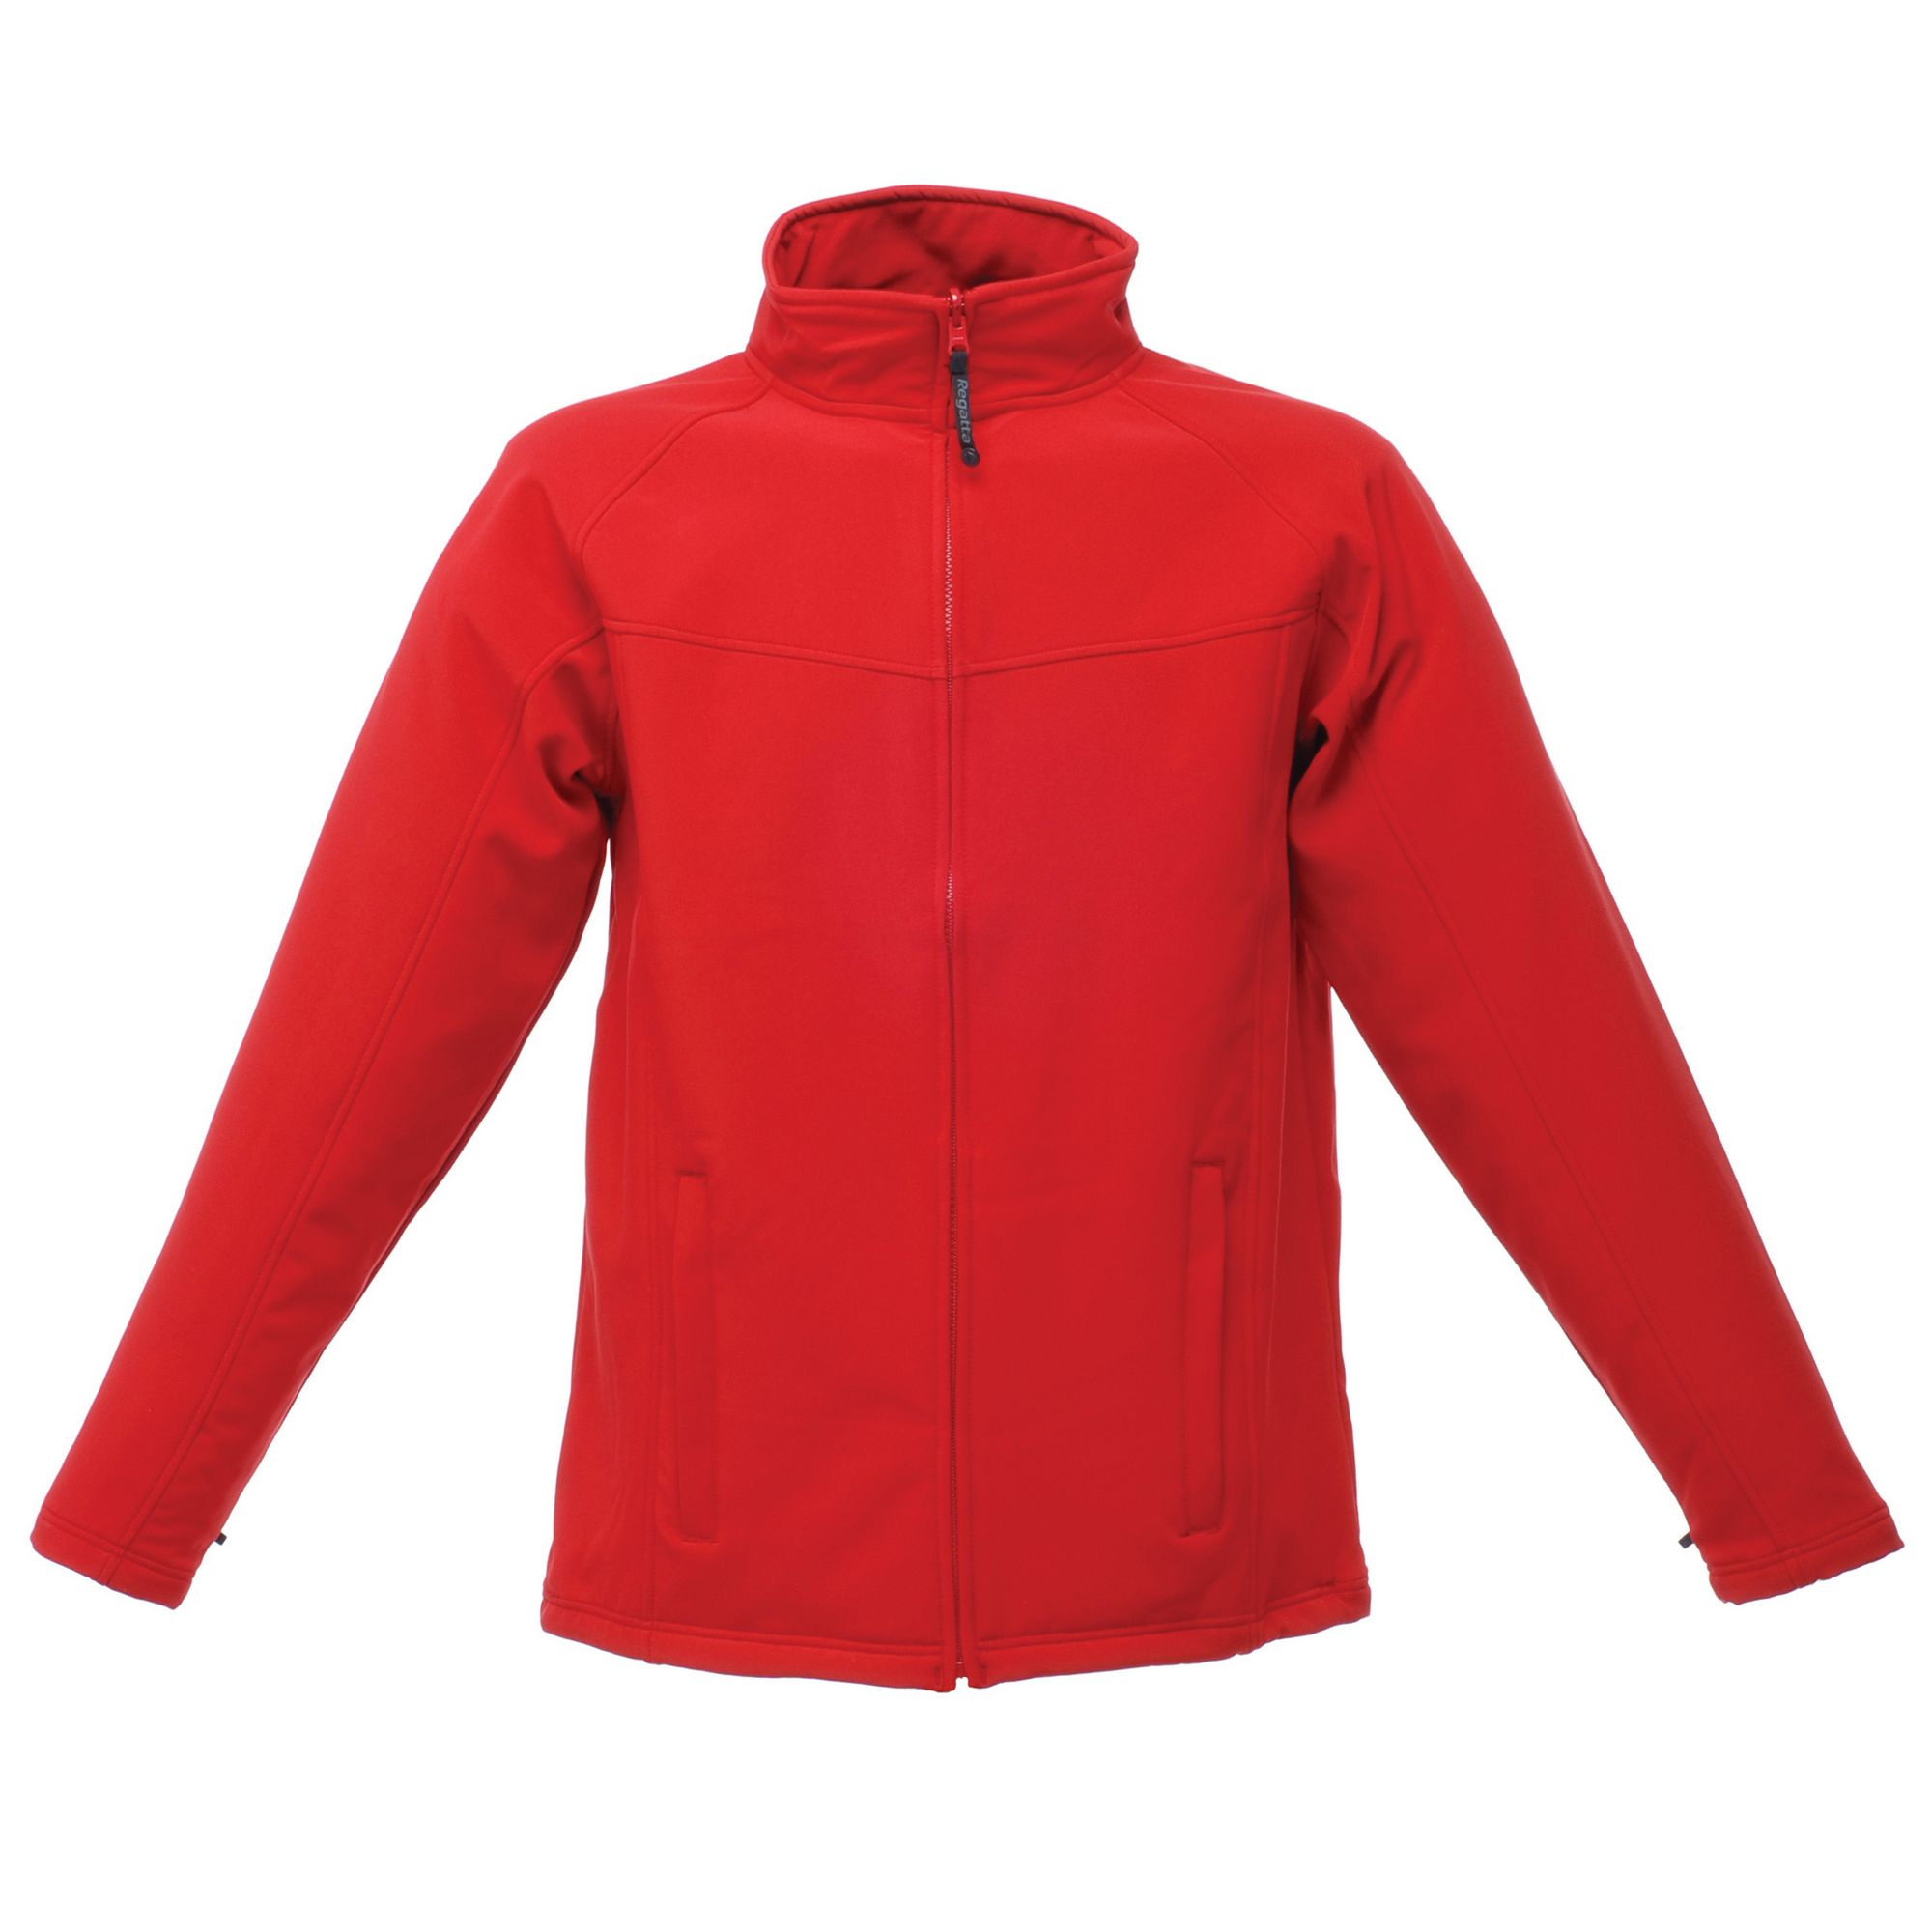 Regatta Mens Uproar Lightweight Wind Resistant Softshell Jacket (Classic Red/Seal Grey)